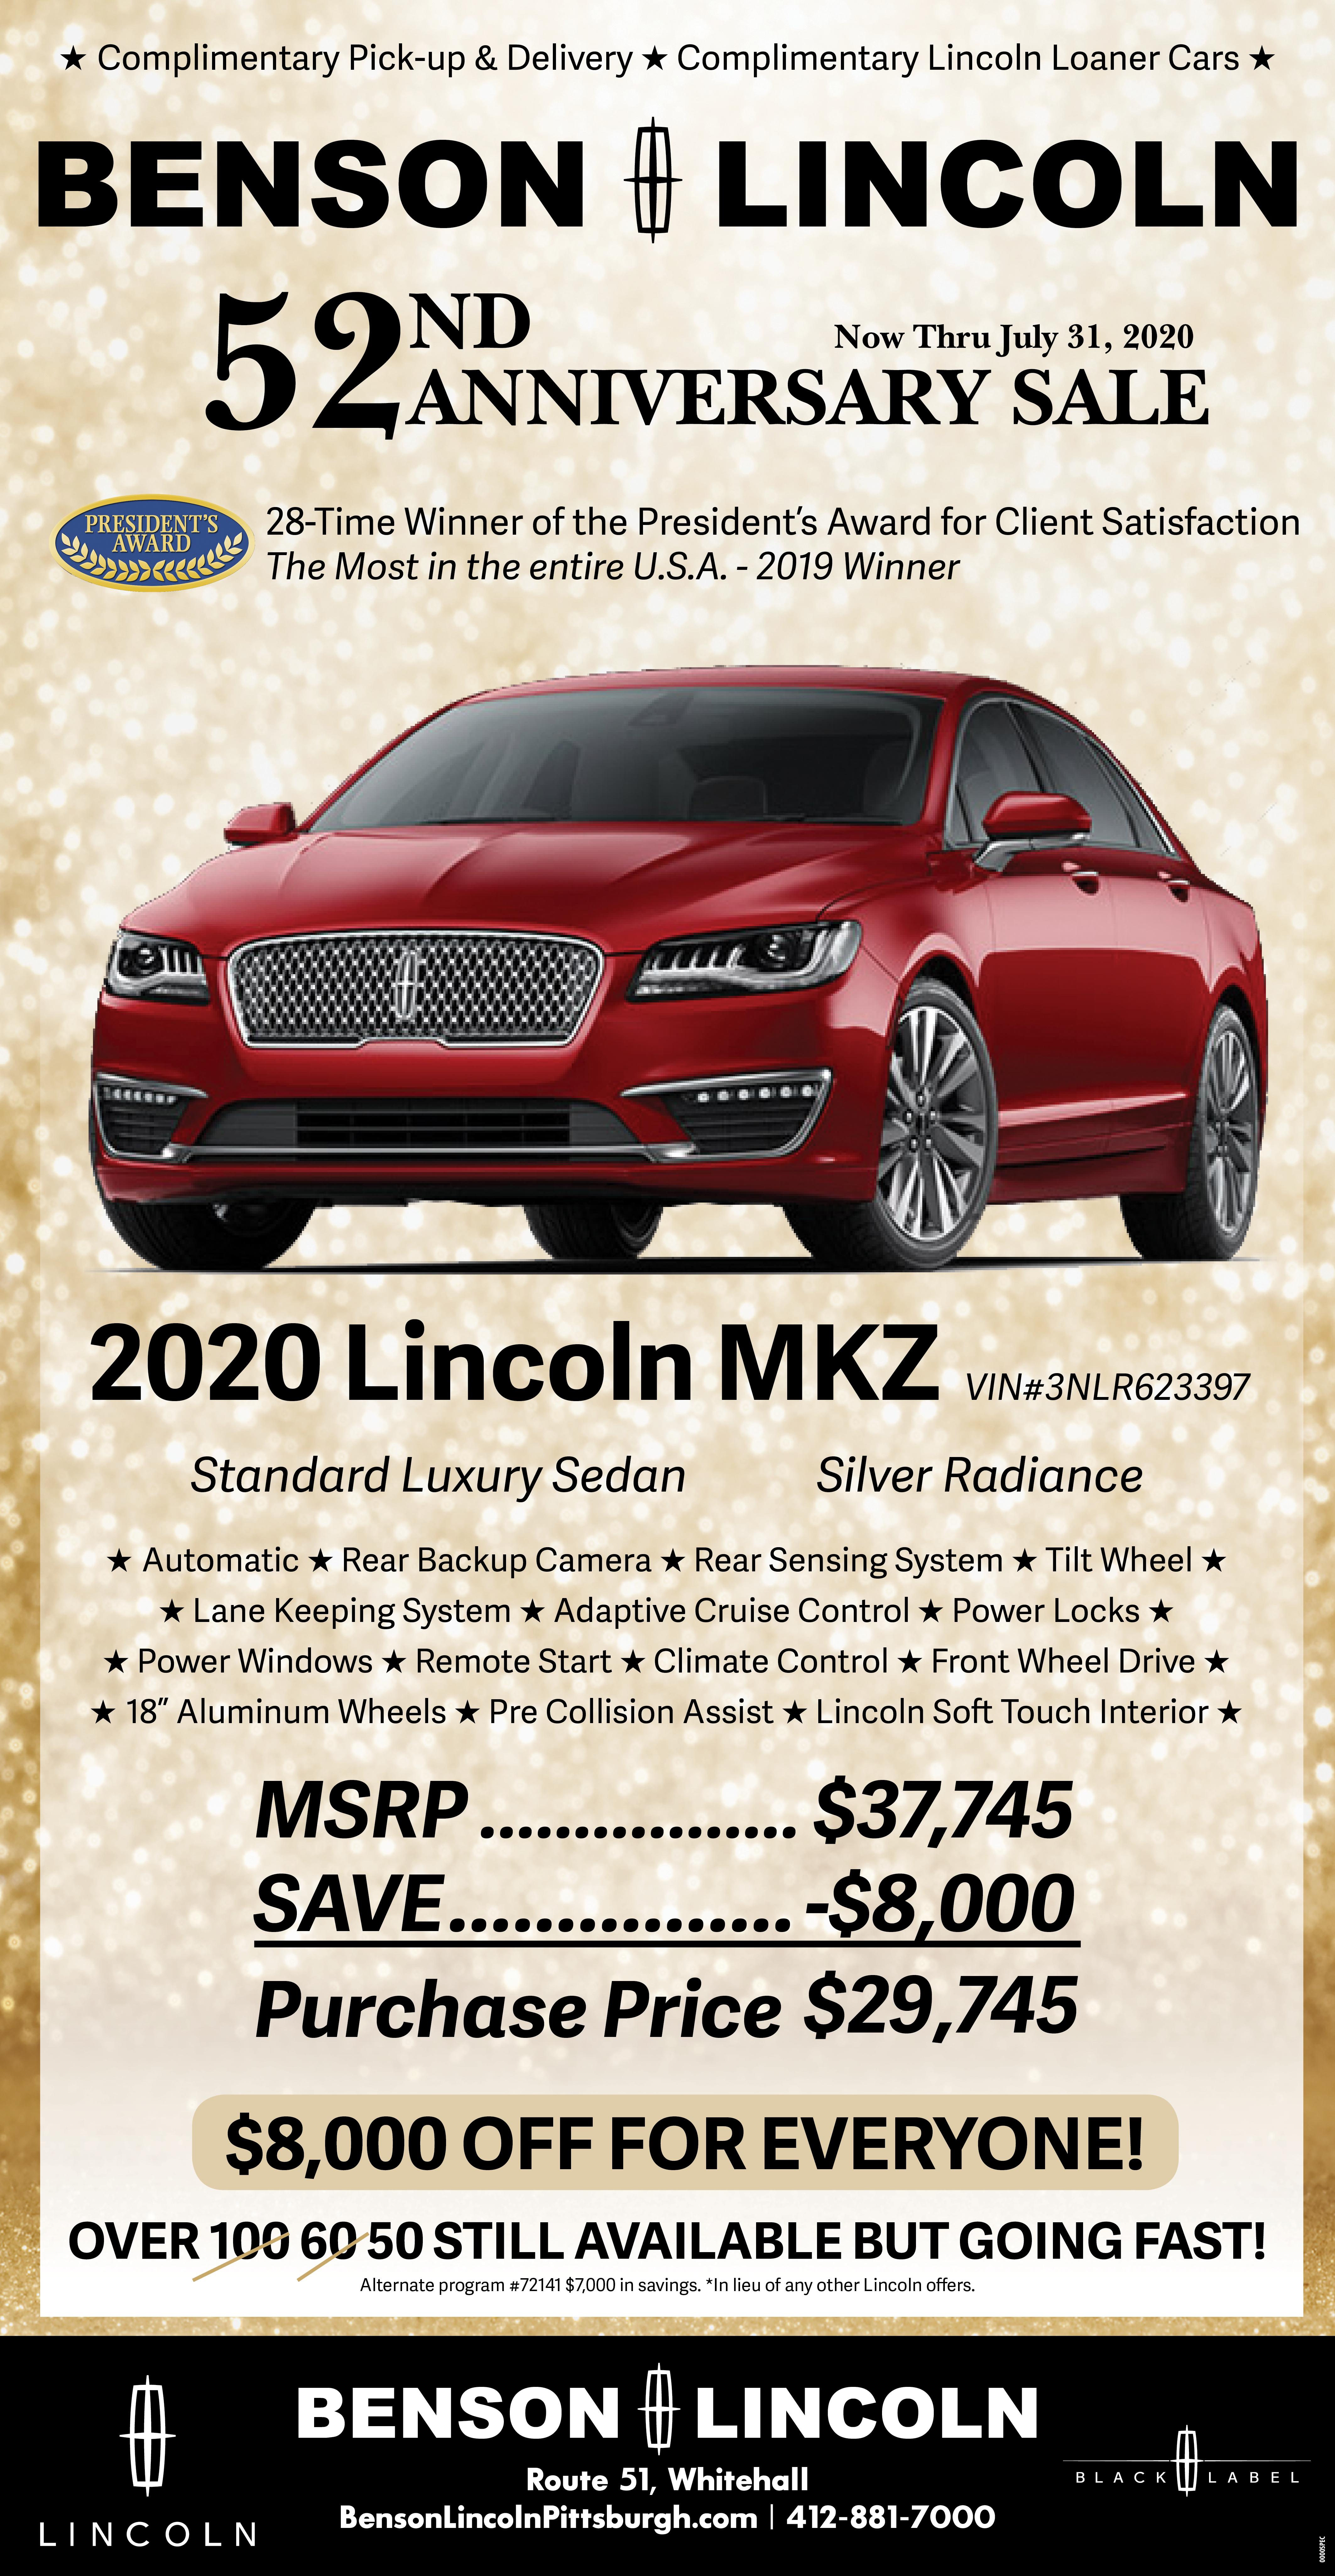 00040913_Benson Lincoln_6x20.5